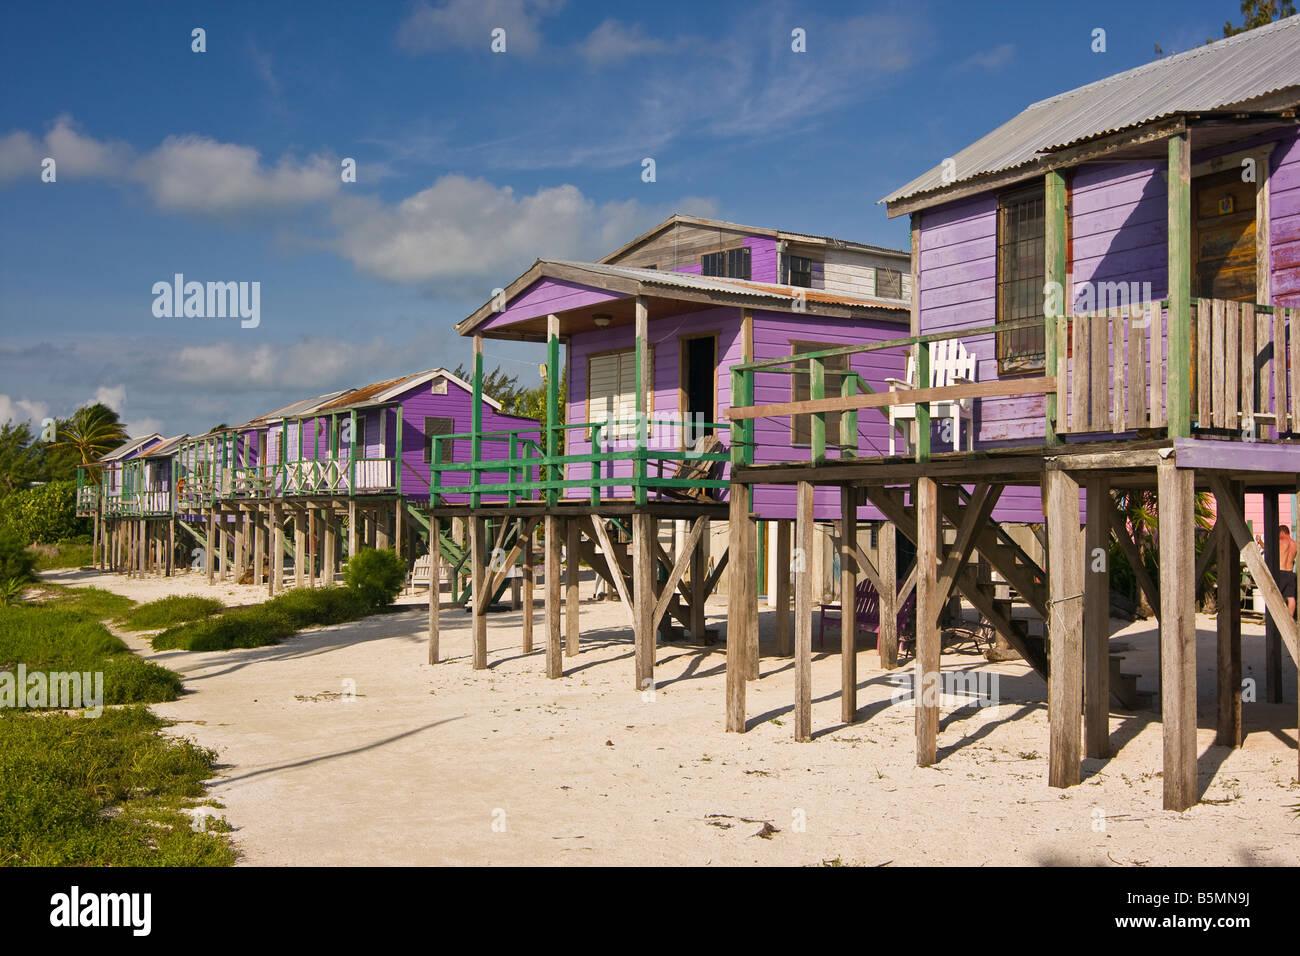 CAYE CAULKER BELIZE Ignacio's Beach Cabins - Stock Image